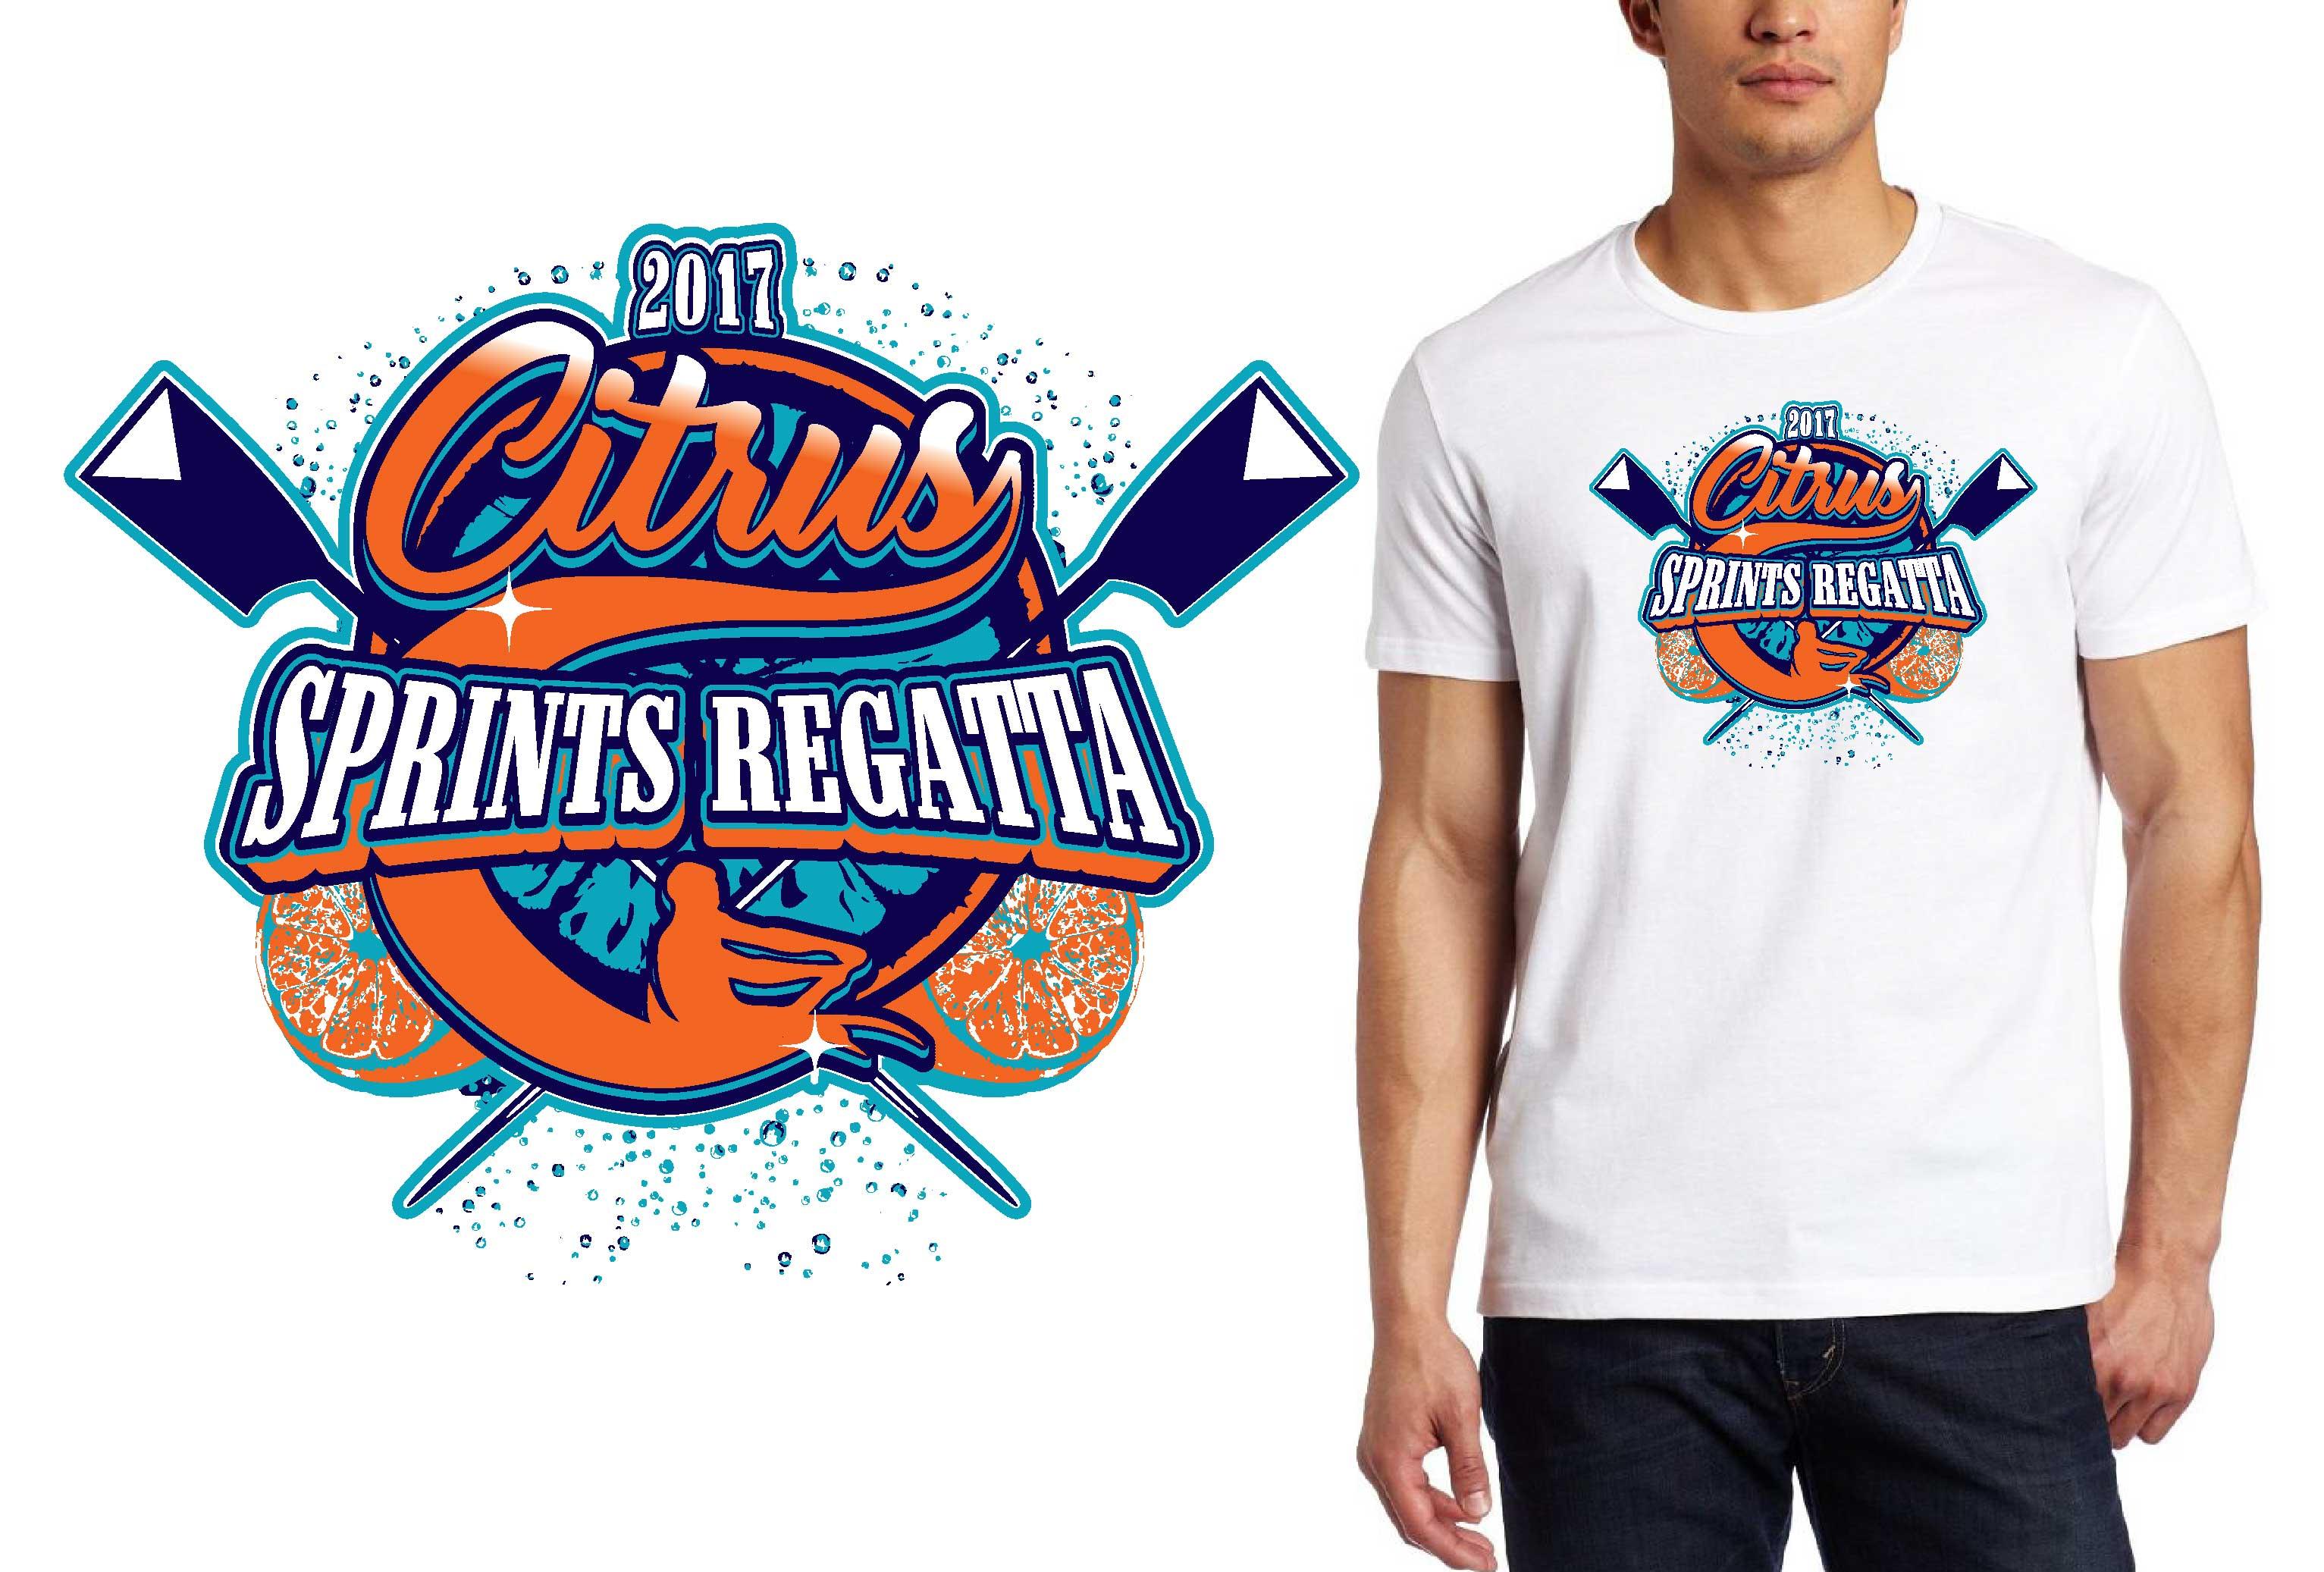 PRINT 1 21 17 Citrus Sprints Regatta t-shirt vector logo design for rowing